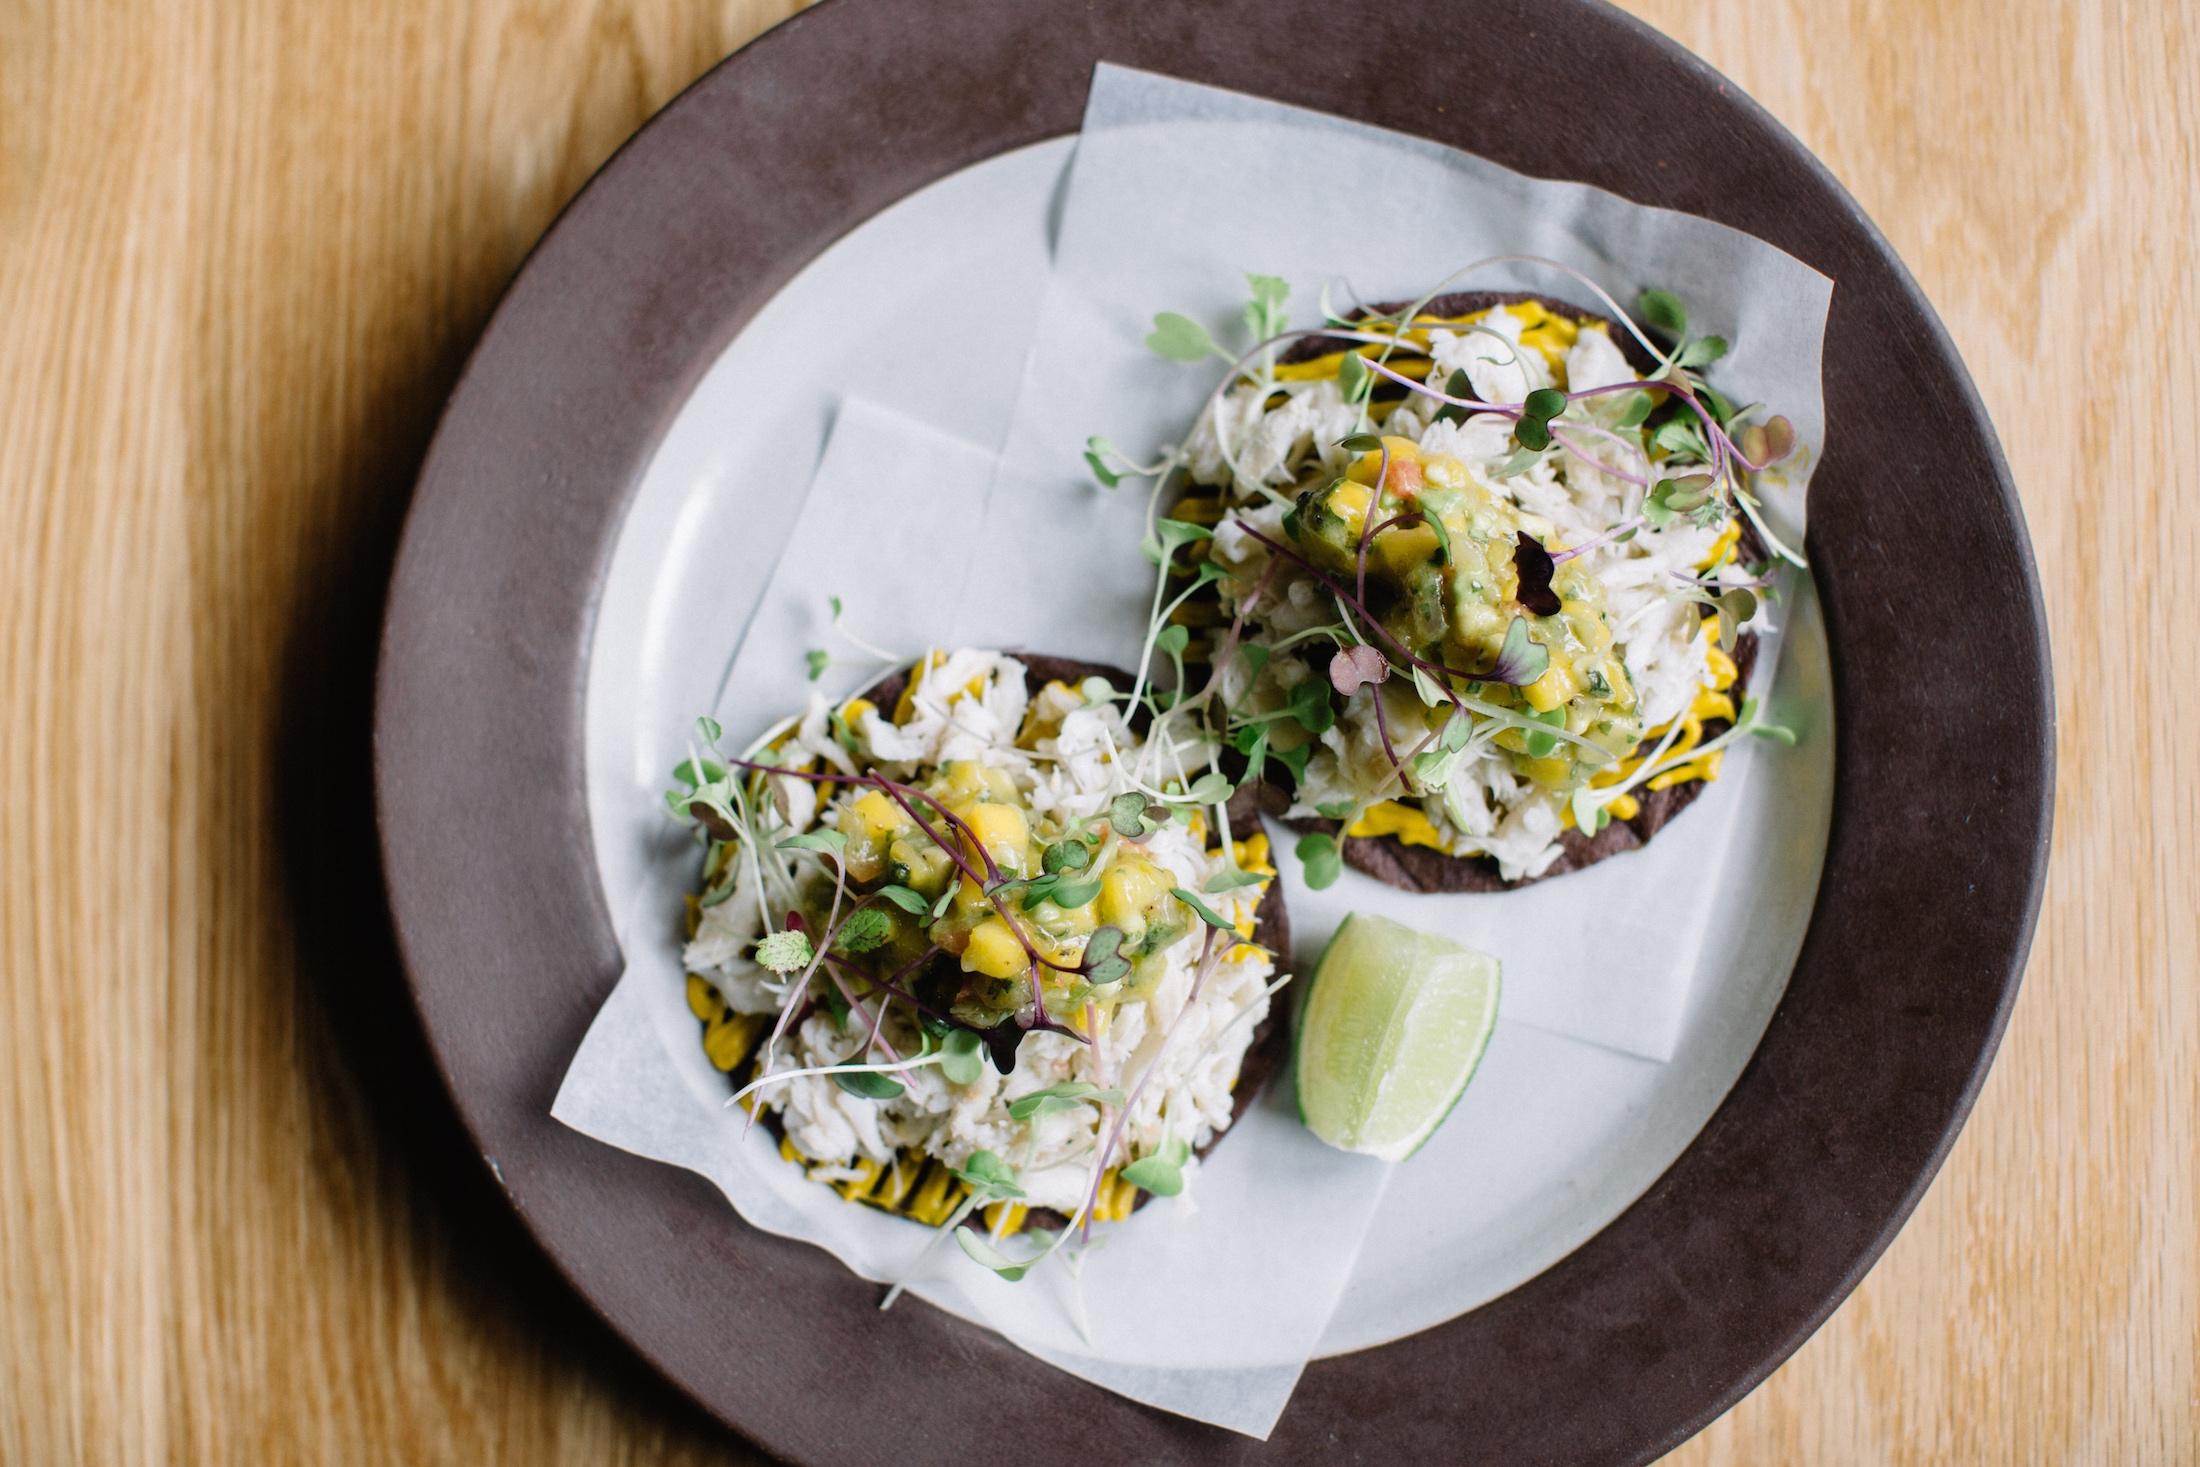 Crunch Into A Crab Tostada With Mango-Avocado Salsa